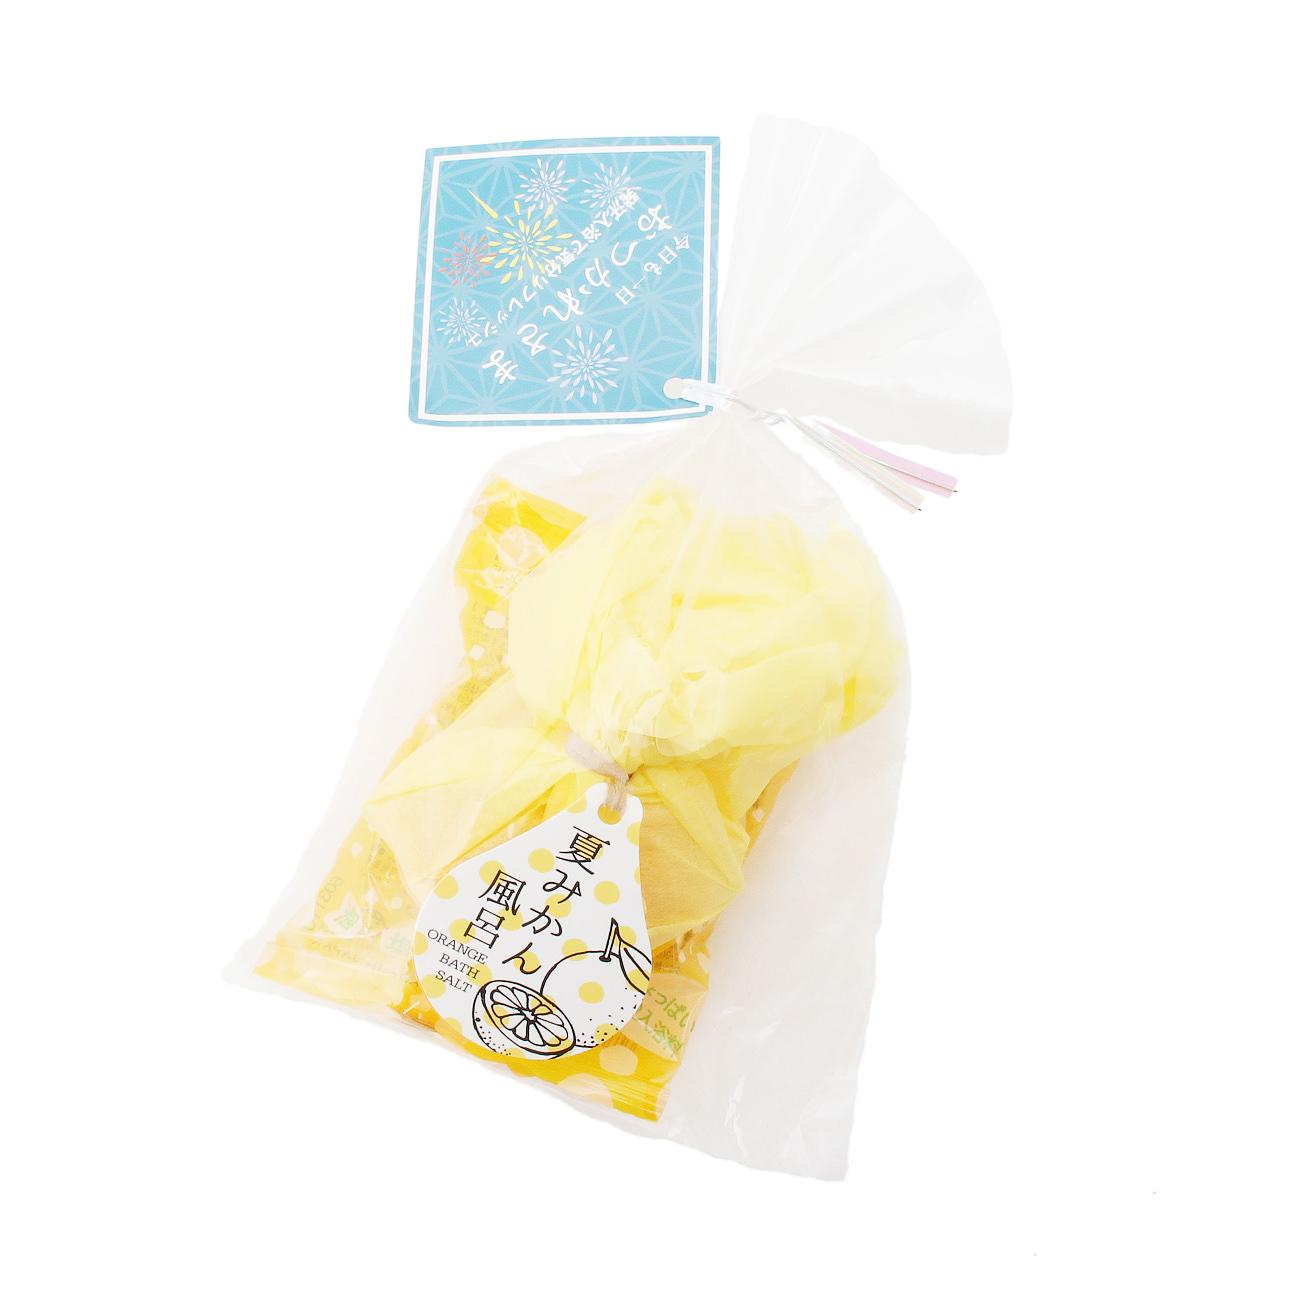 【grove (グローブ)】おまつりプチギフト入浴剤レディース ビューティー・コスメ|ボディケア レモンイエロー